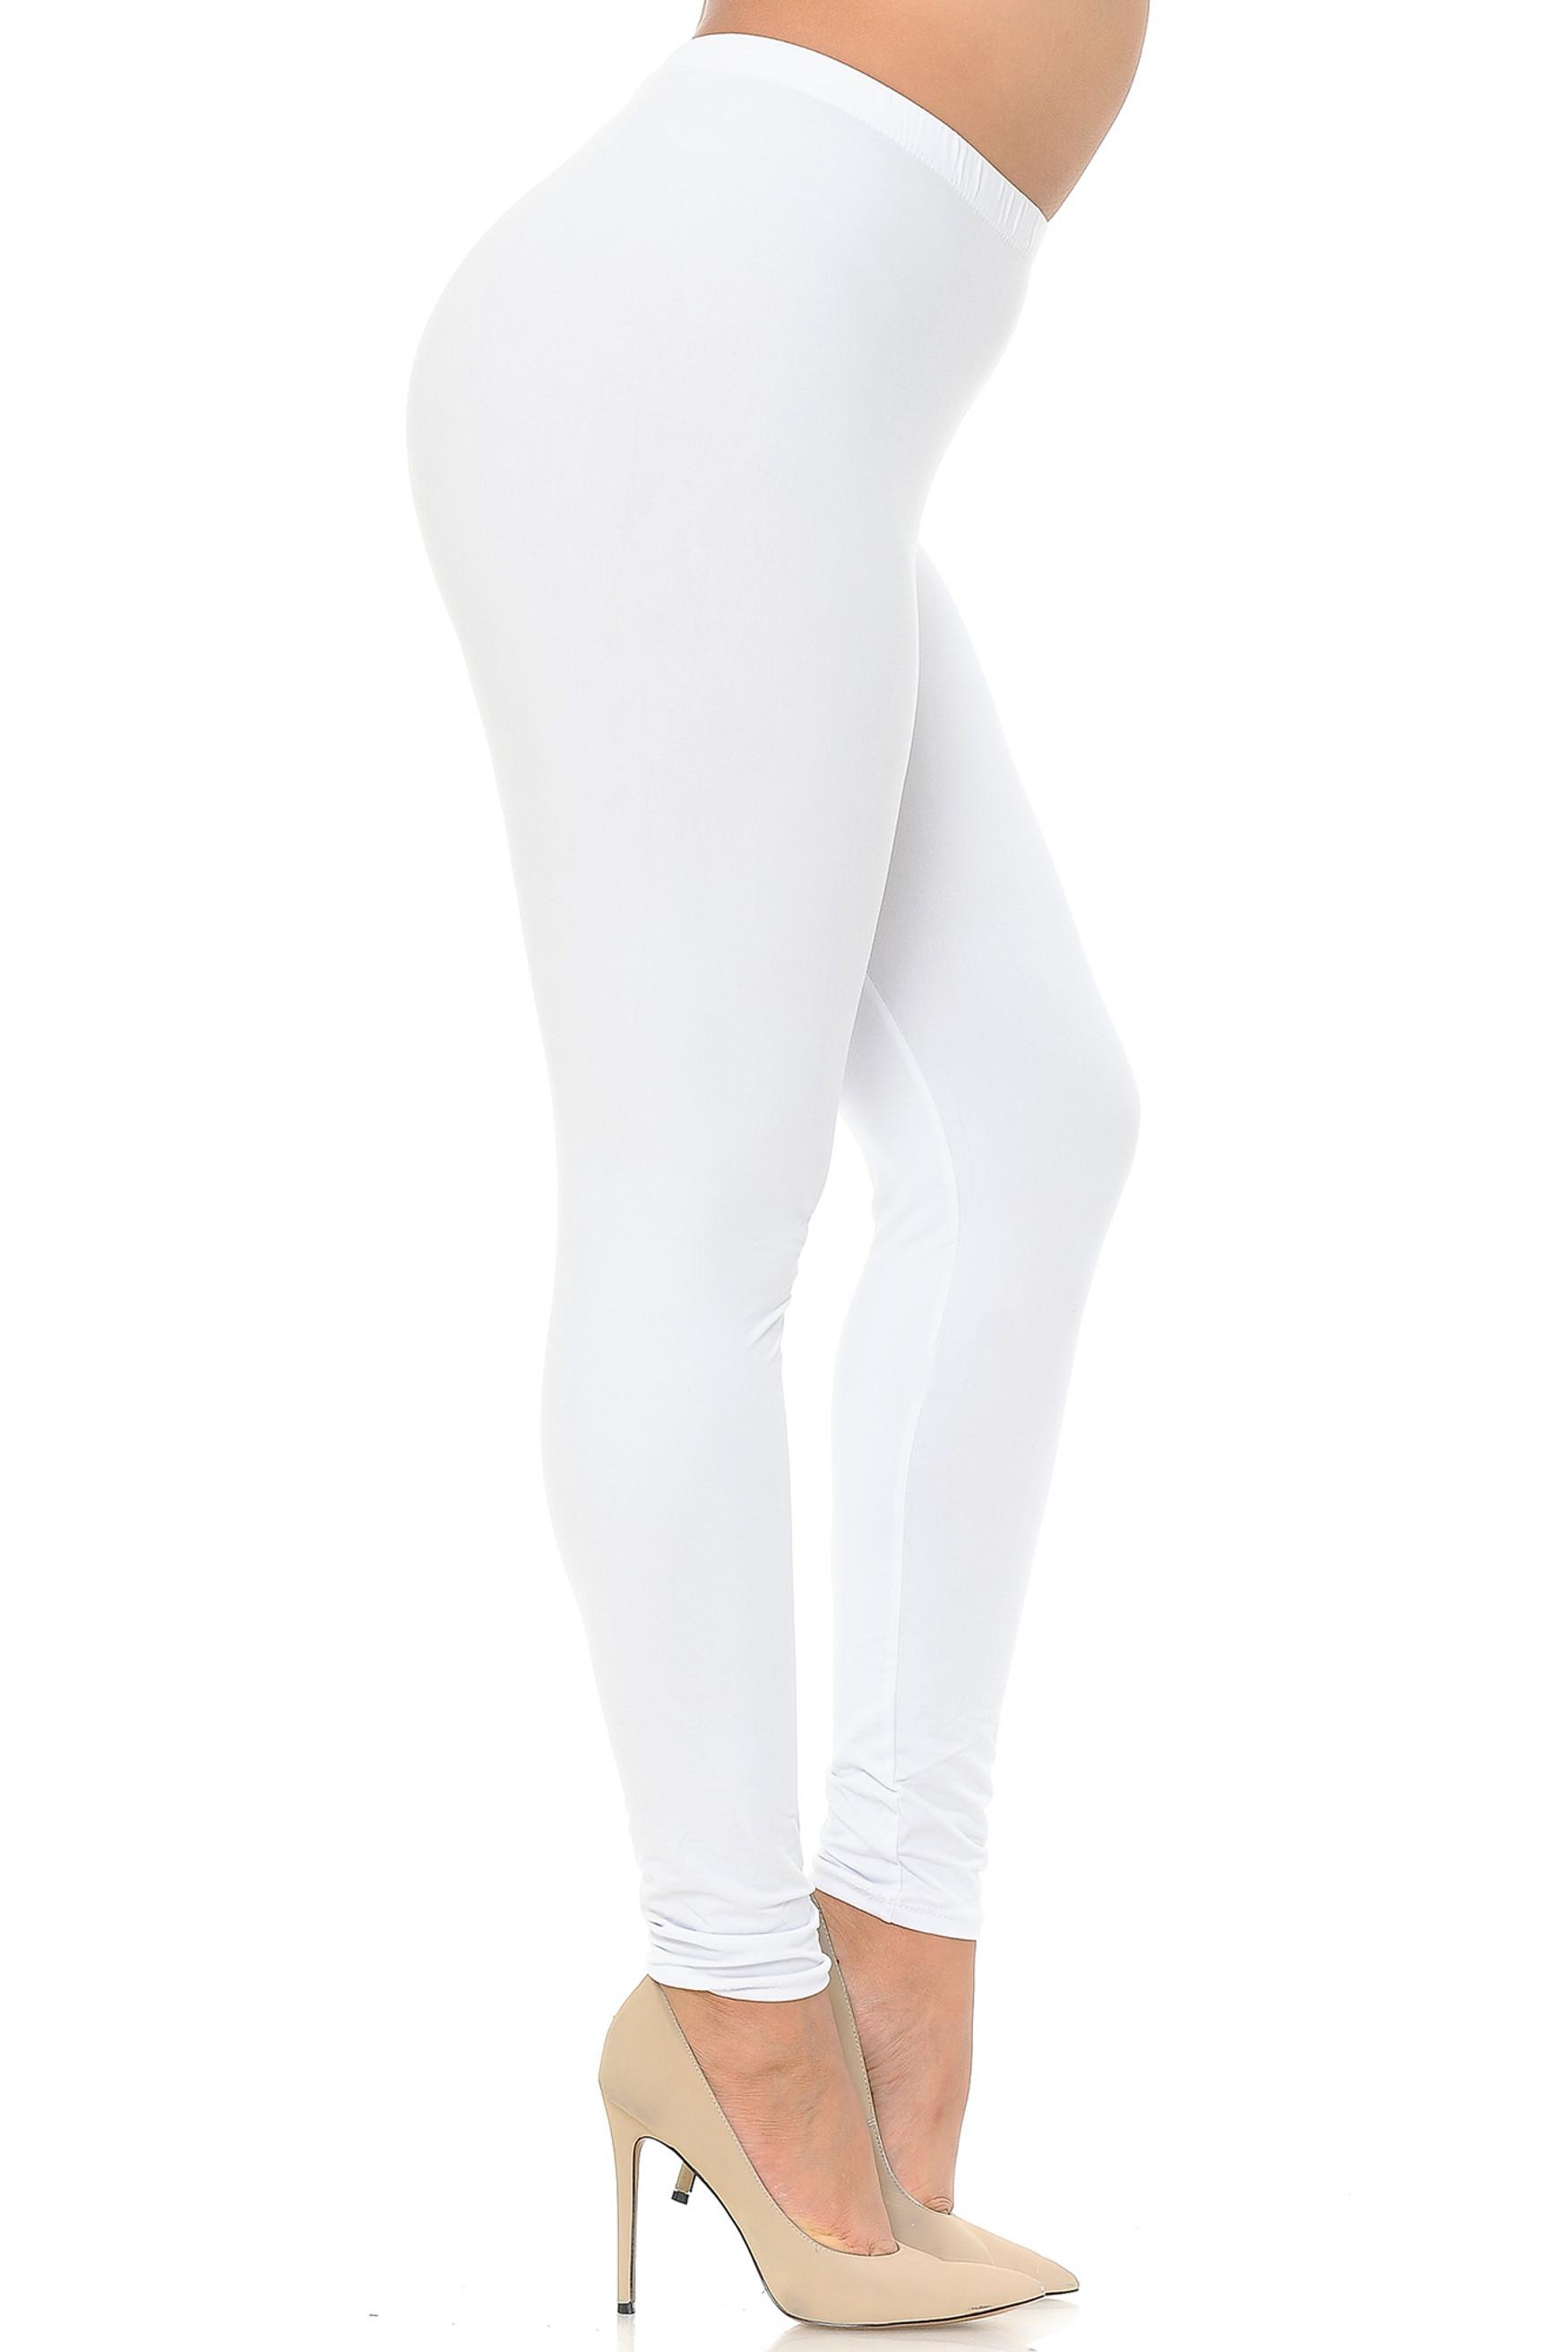 Brushed Basic Solid Plus Size Leggings - EEVEE